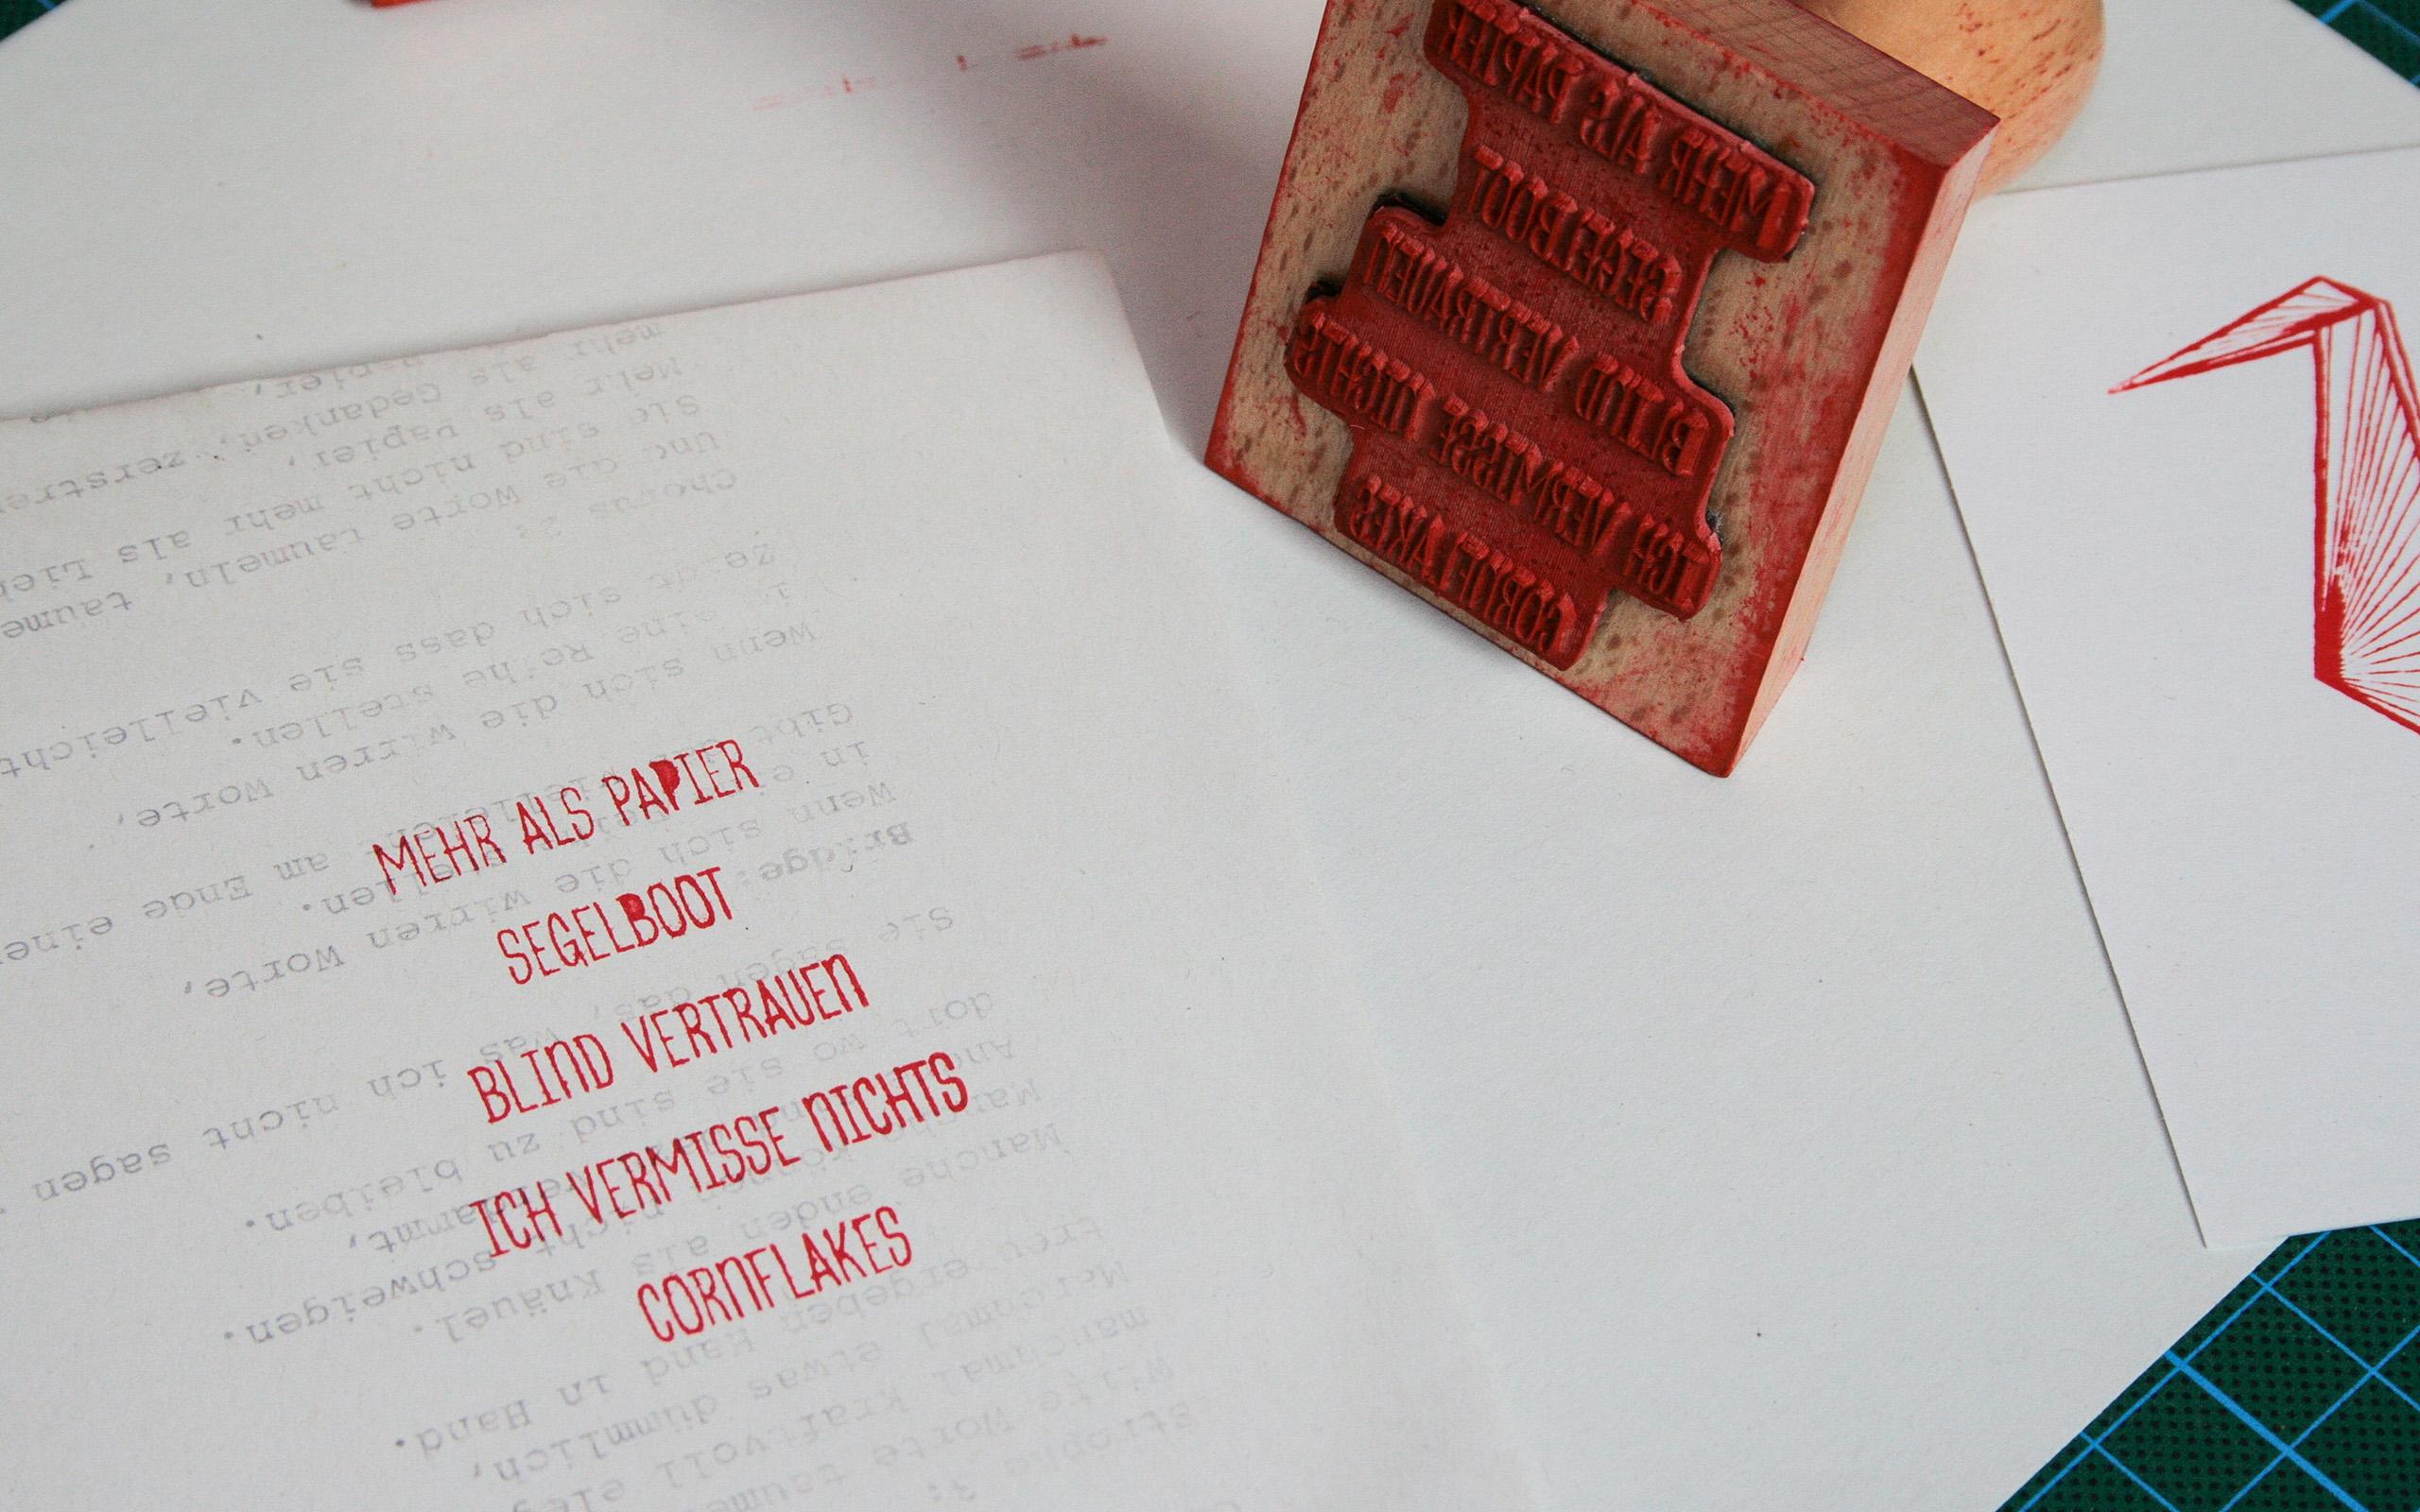 CD Florijan van der Holz Stempel